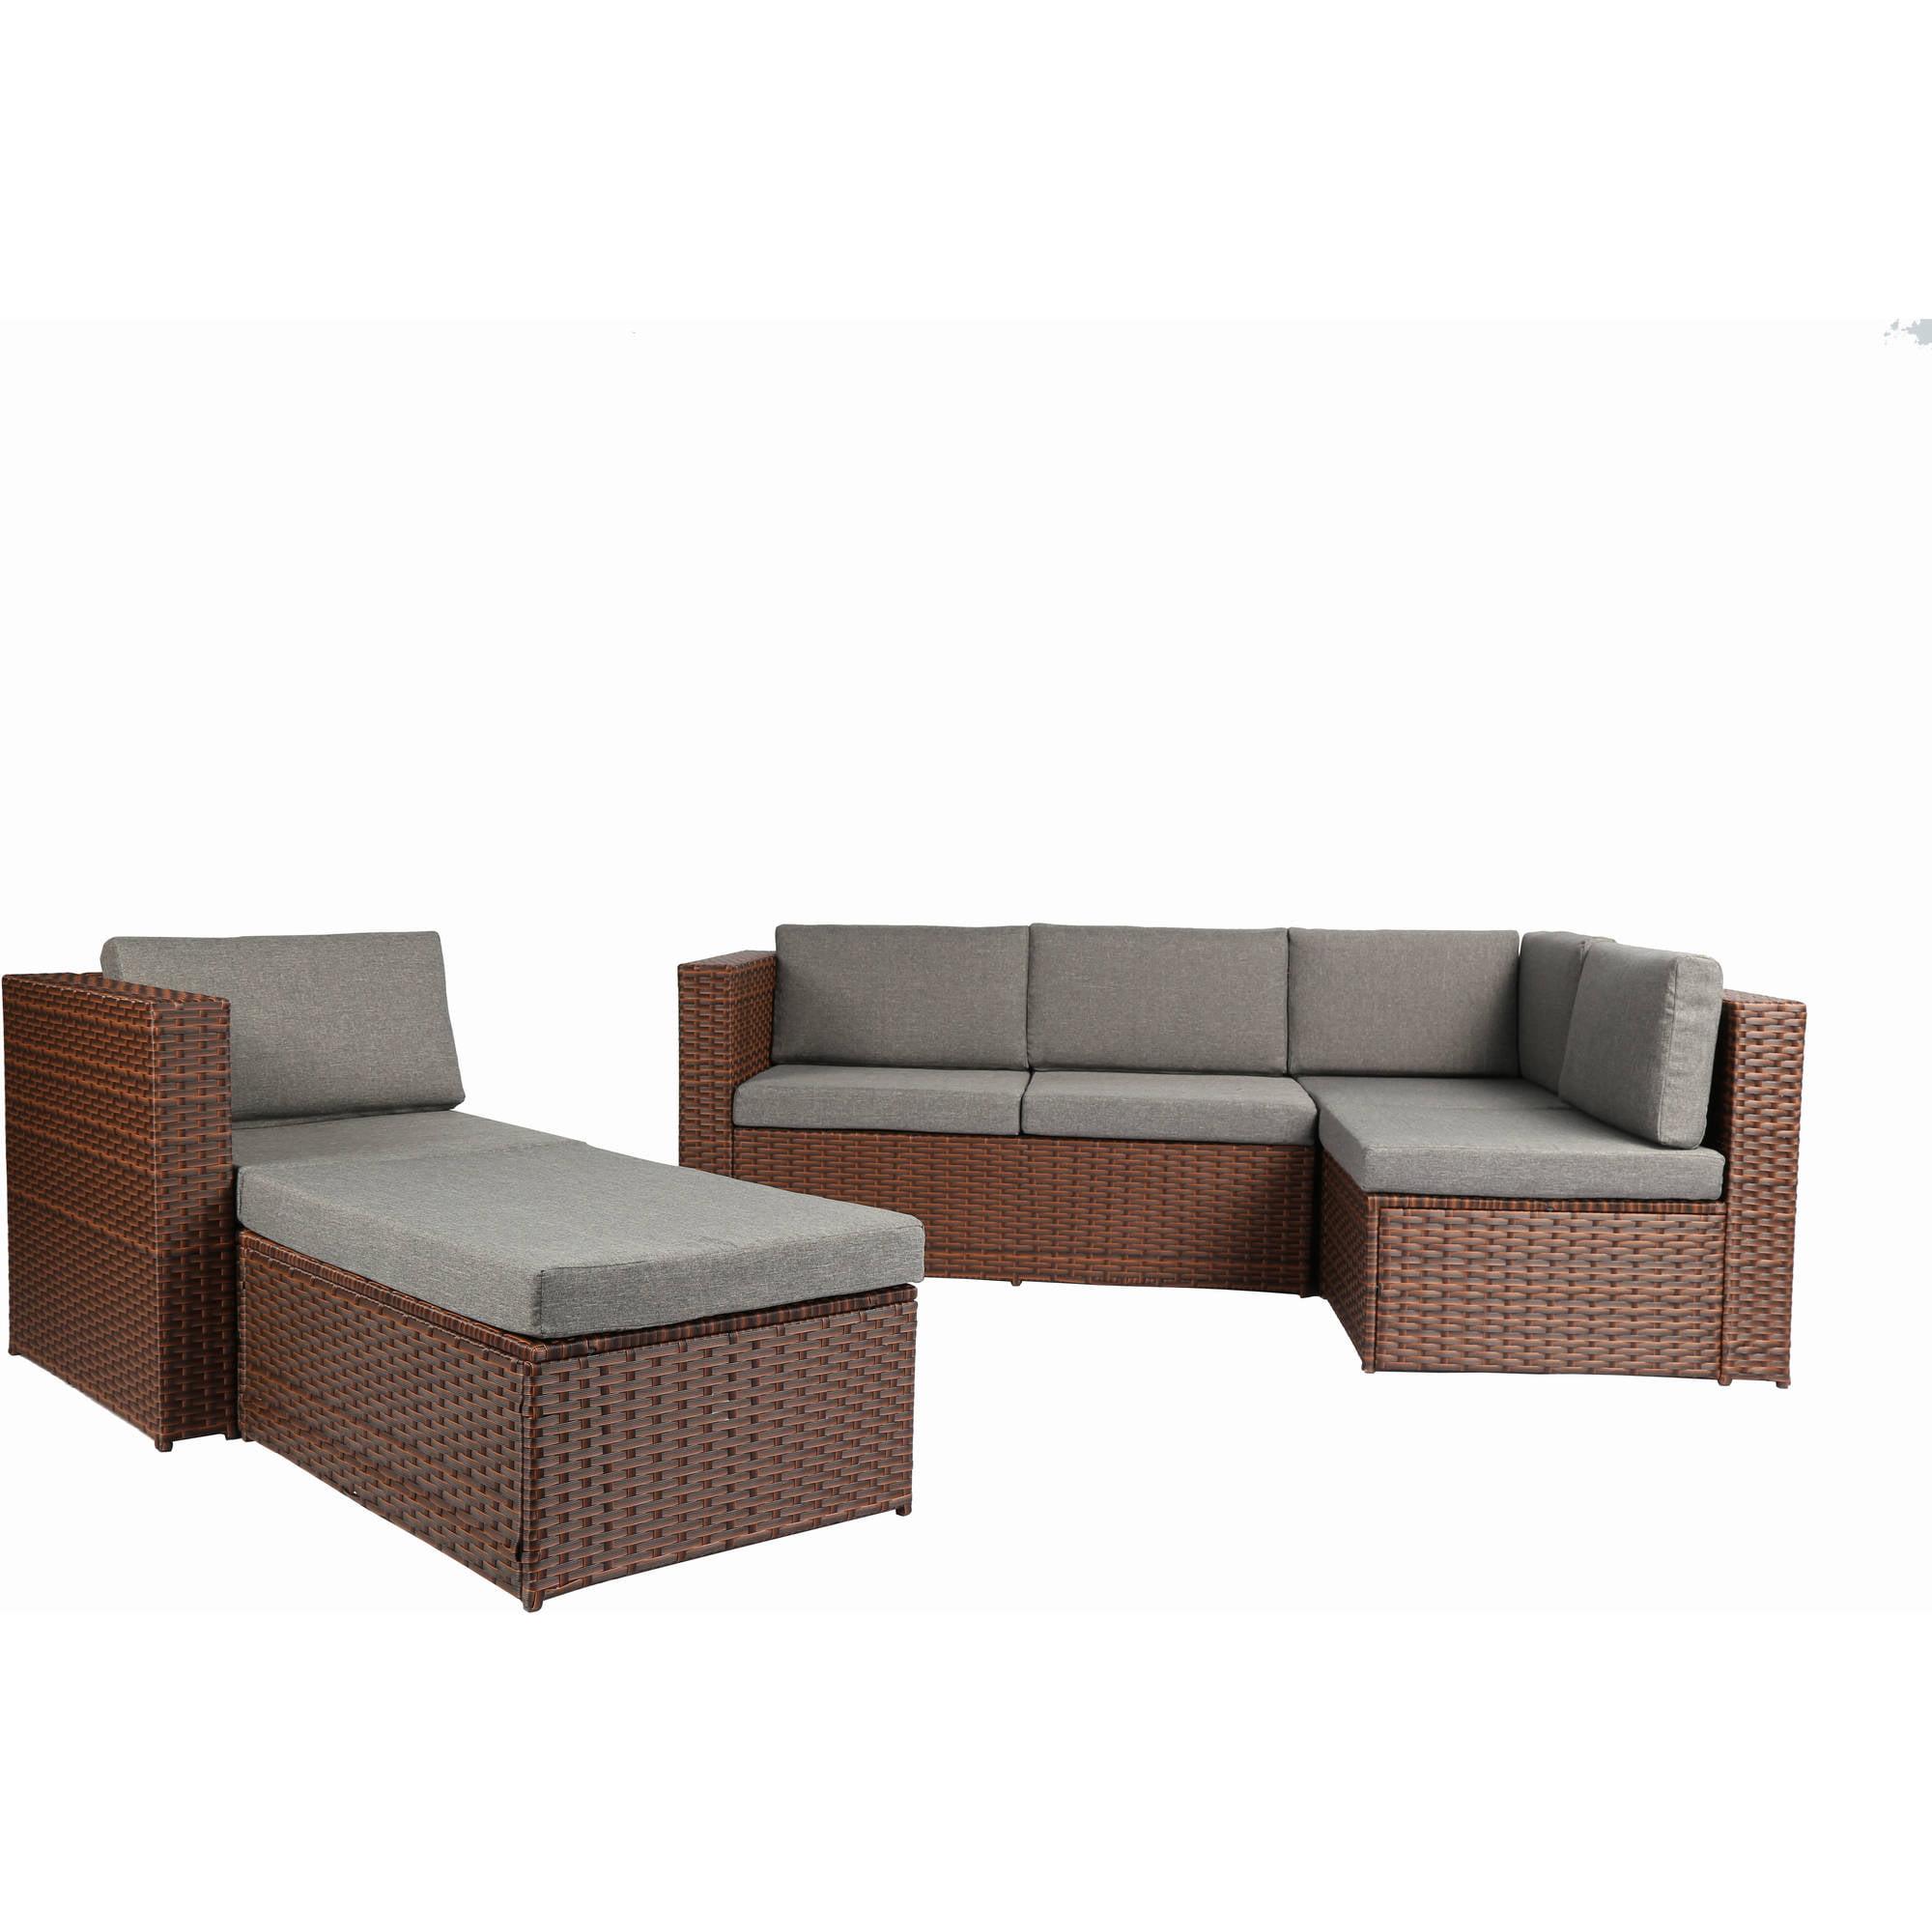 baner garden outdoor furniture complete patio cushion pe